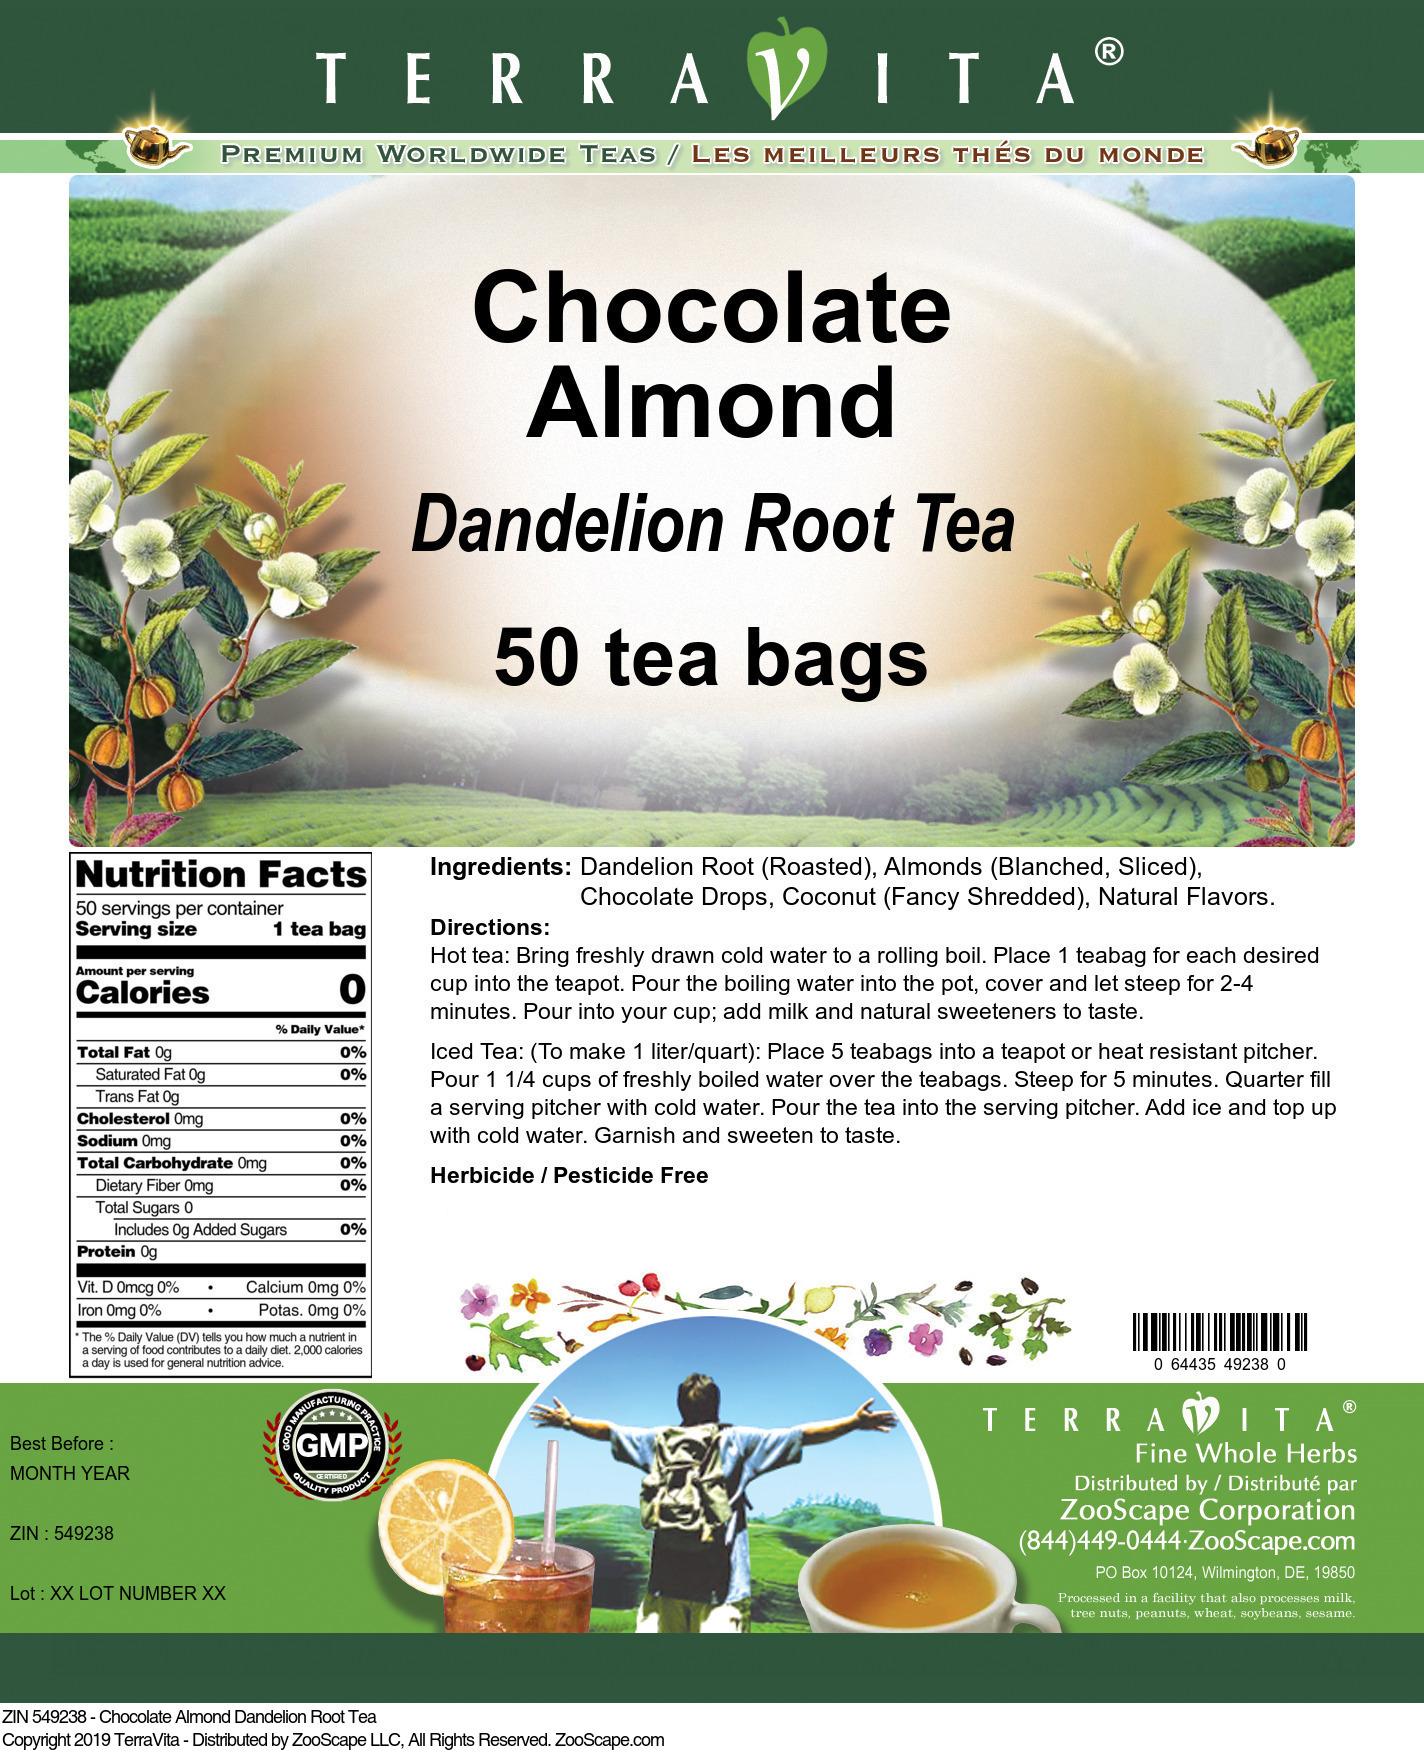 Chocolate Almond Dandelion Root Tea